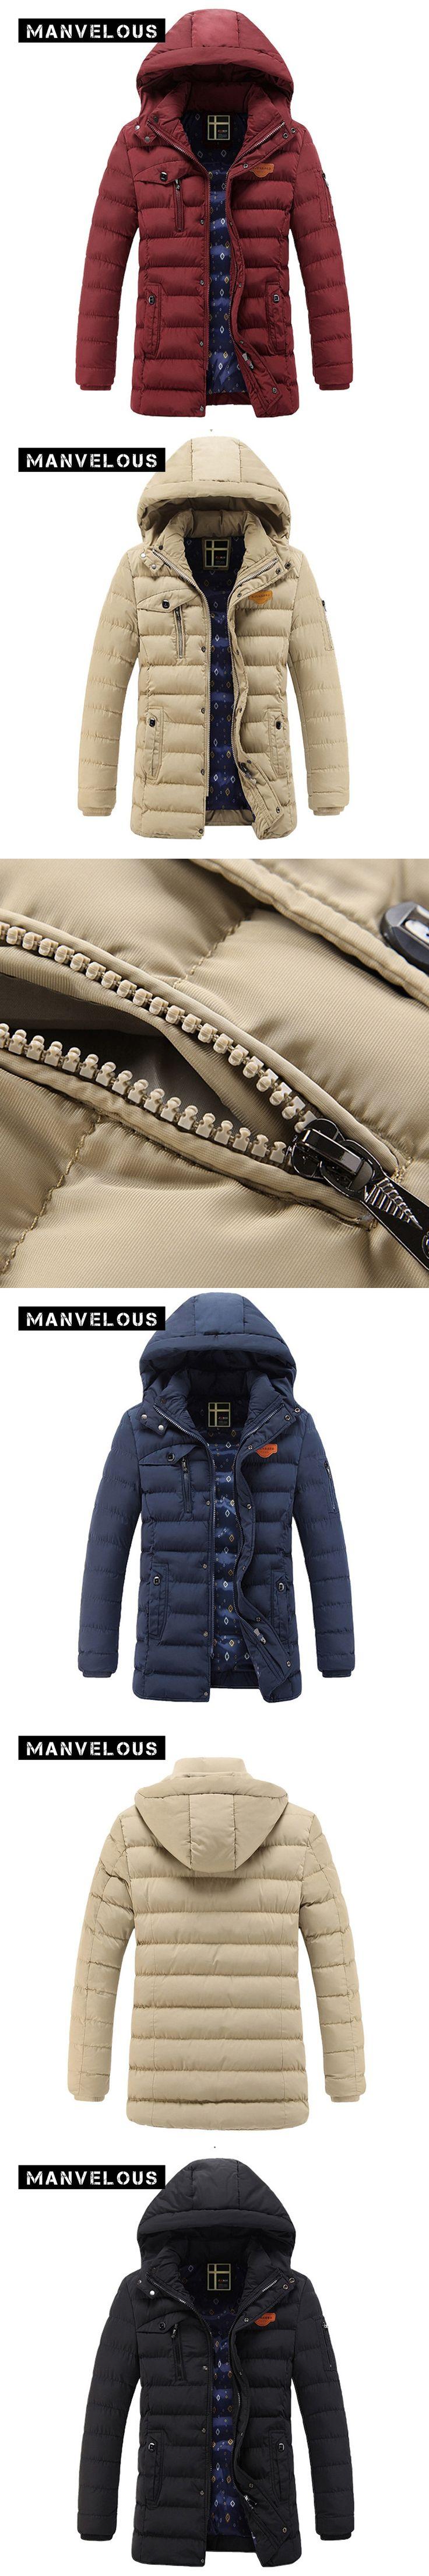 Manvelous Winter Parkas Jacket Men European Style Fashion Casual Slim Solid Pocket Zipper Hooded Mens Winter Down Jackets Coats